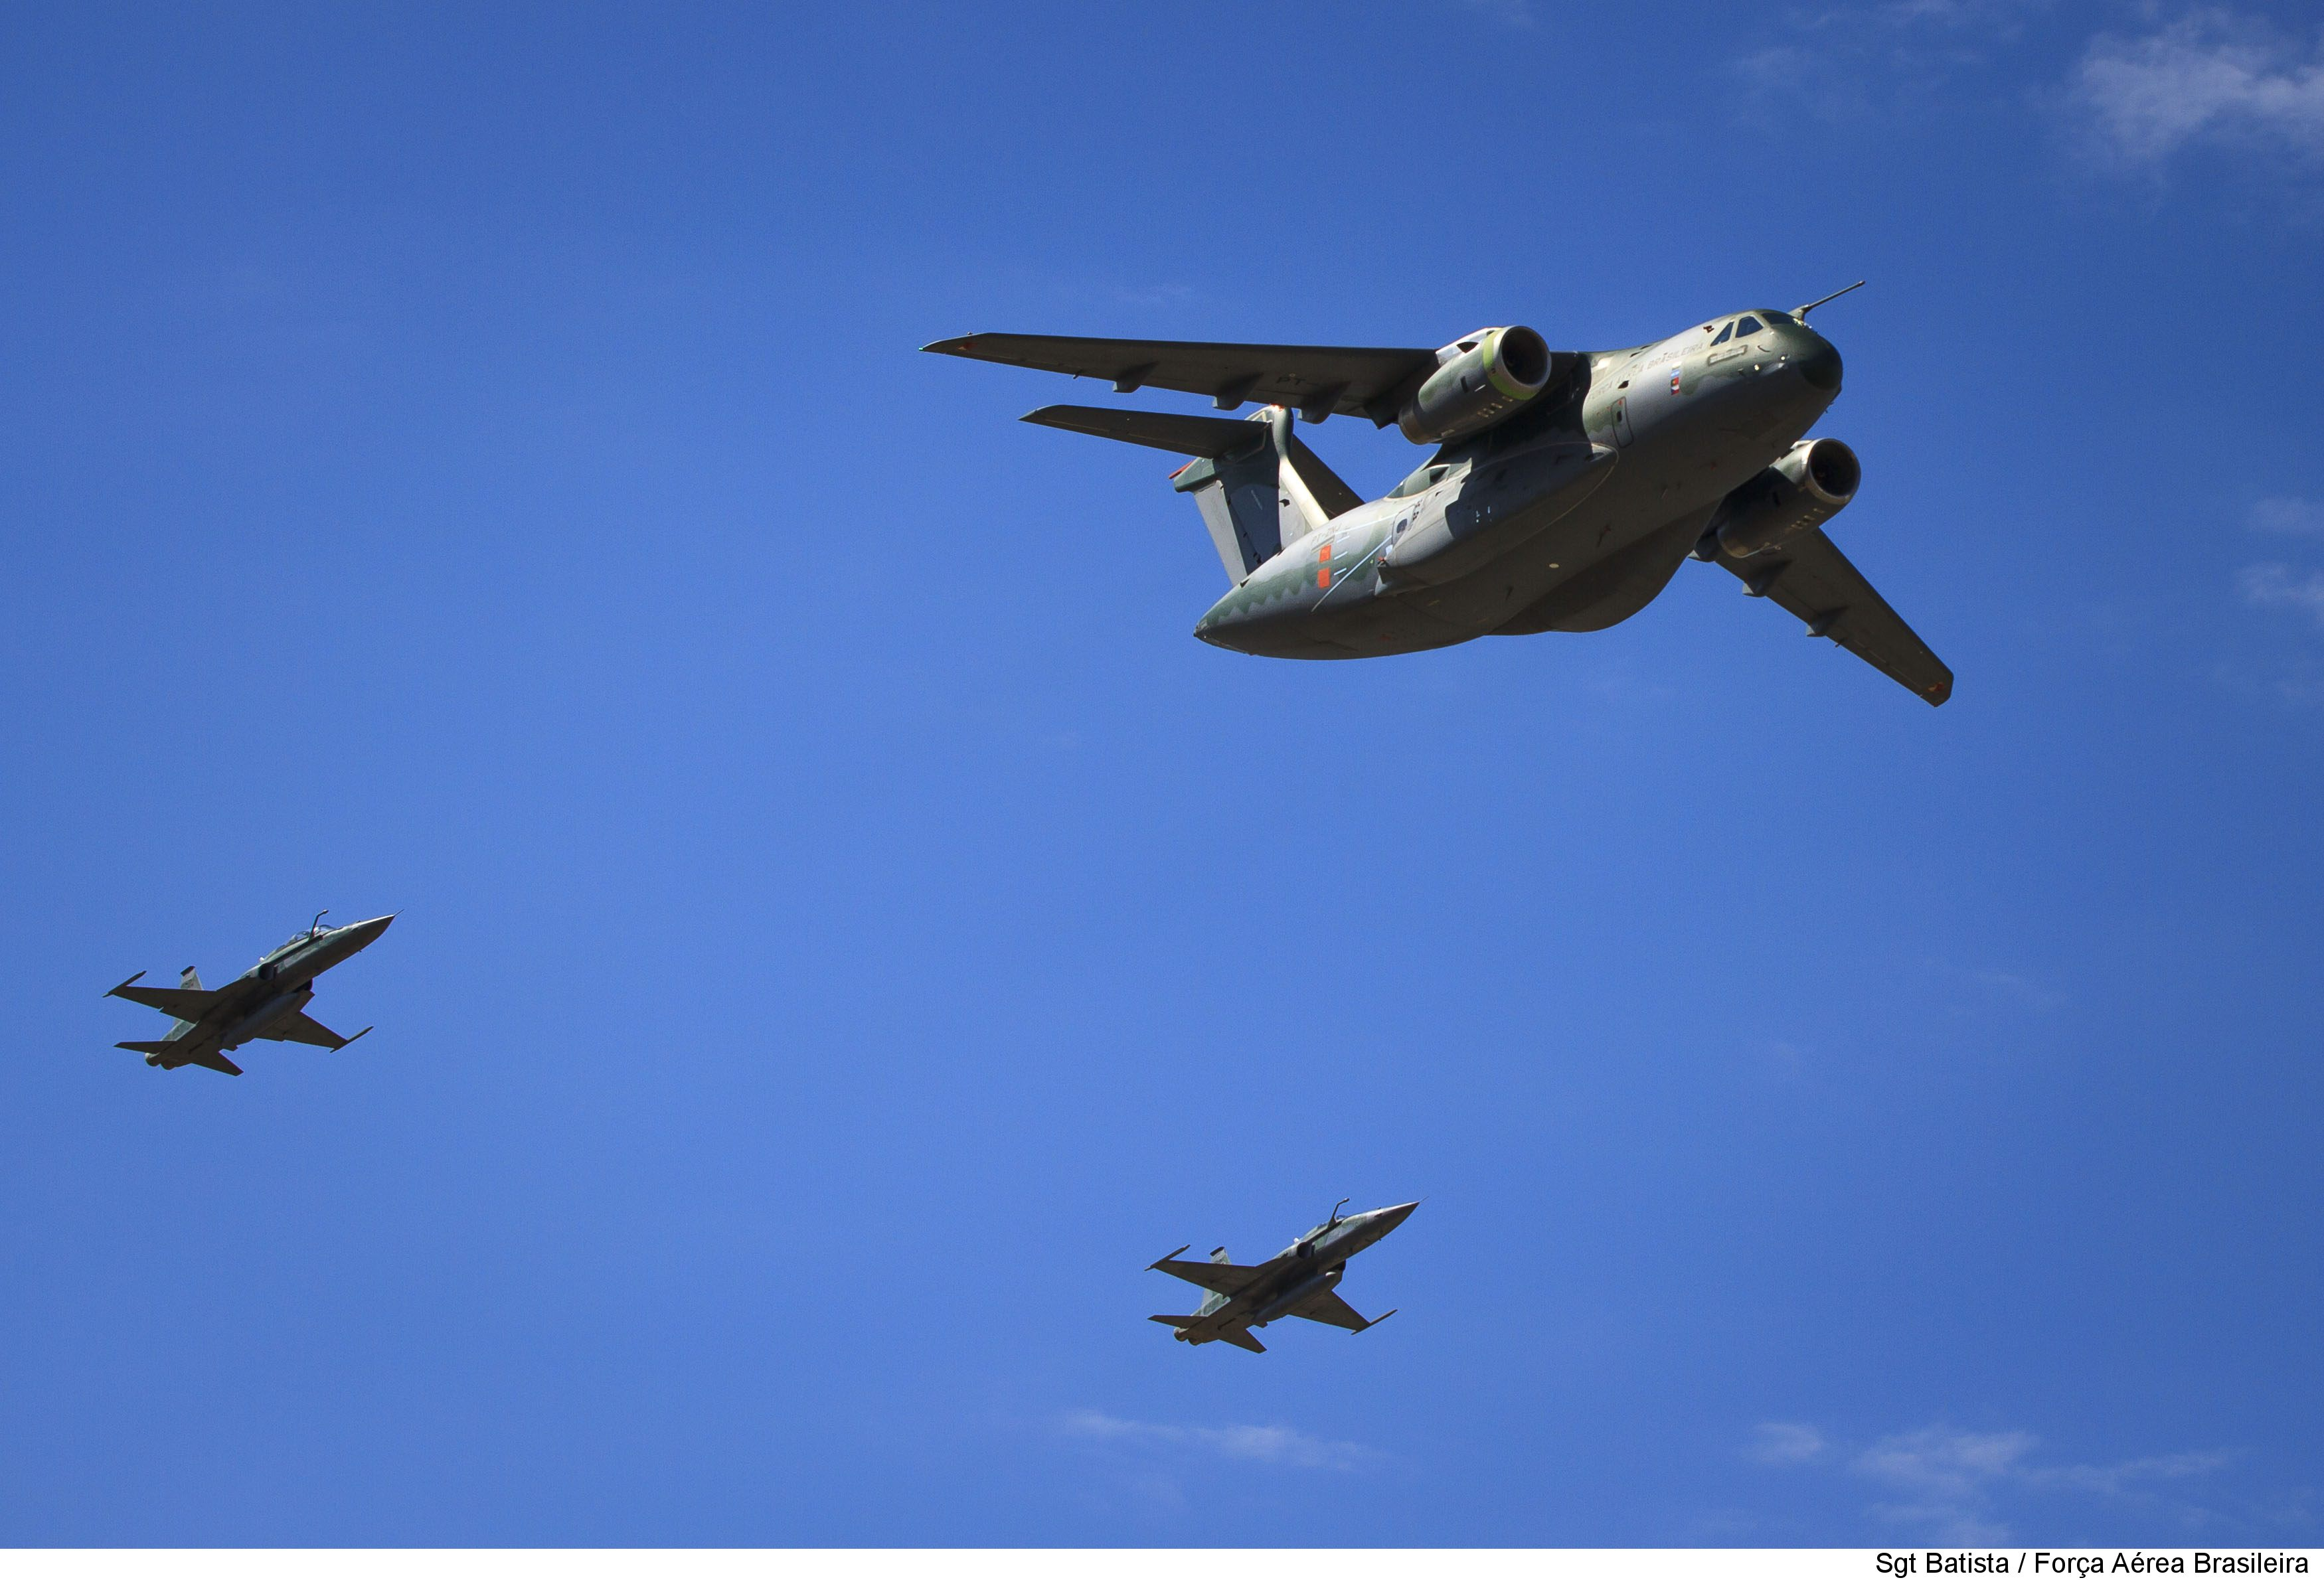 EMBRAER KC-390  - Página 3 29522377355_3dc21667c1_o